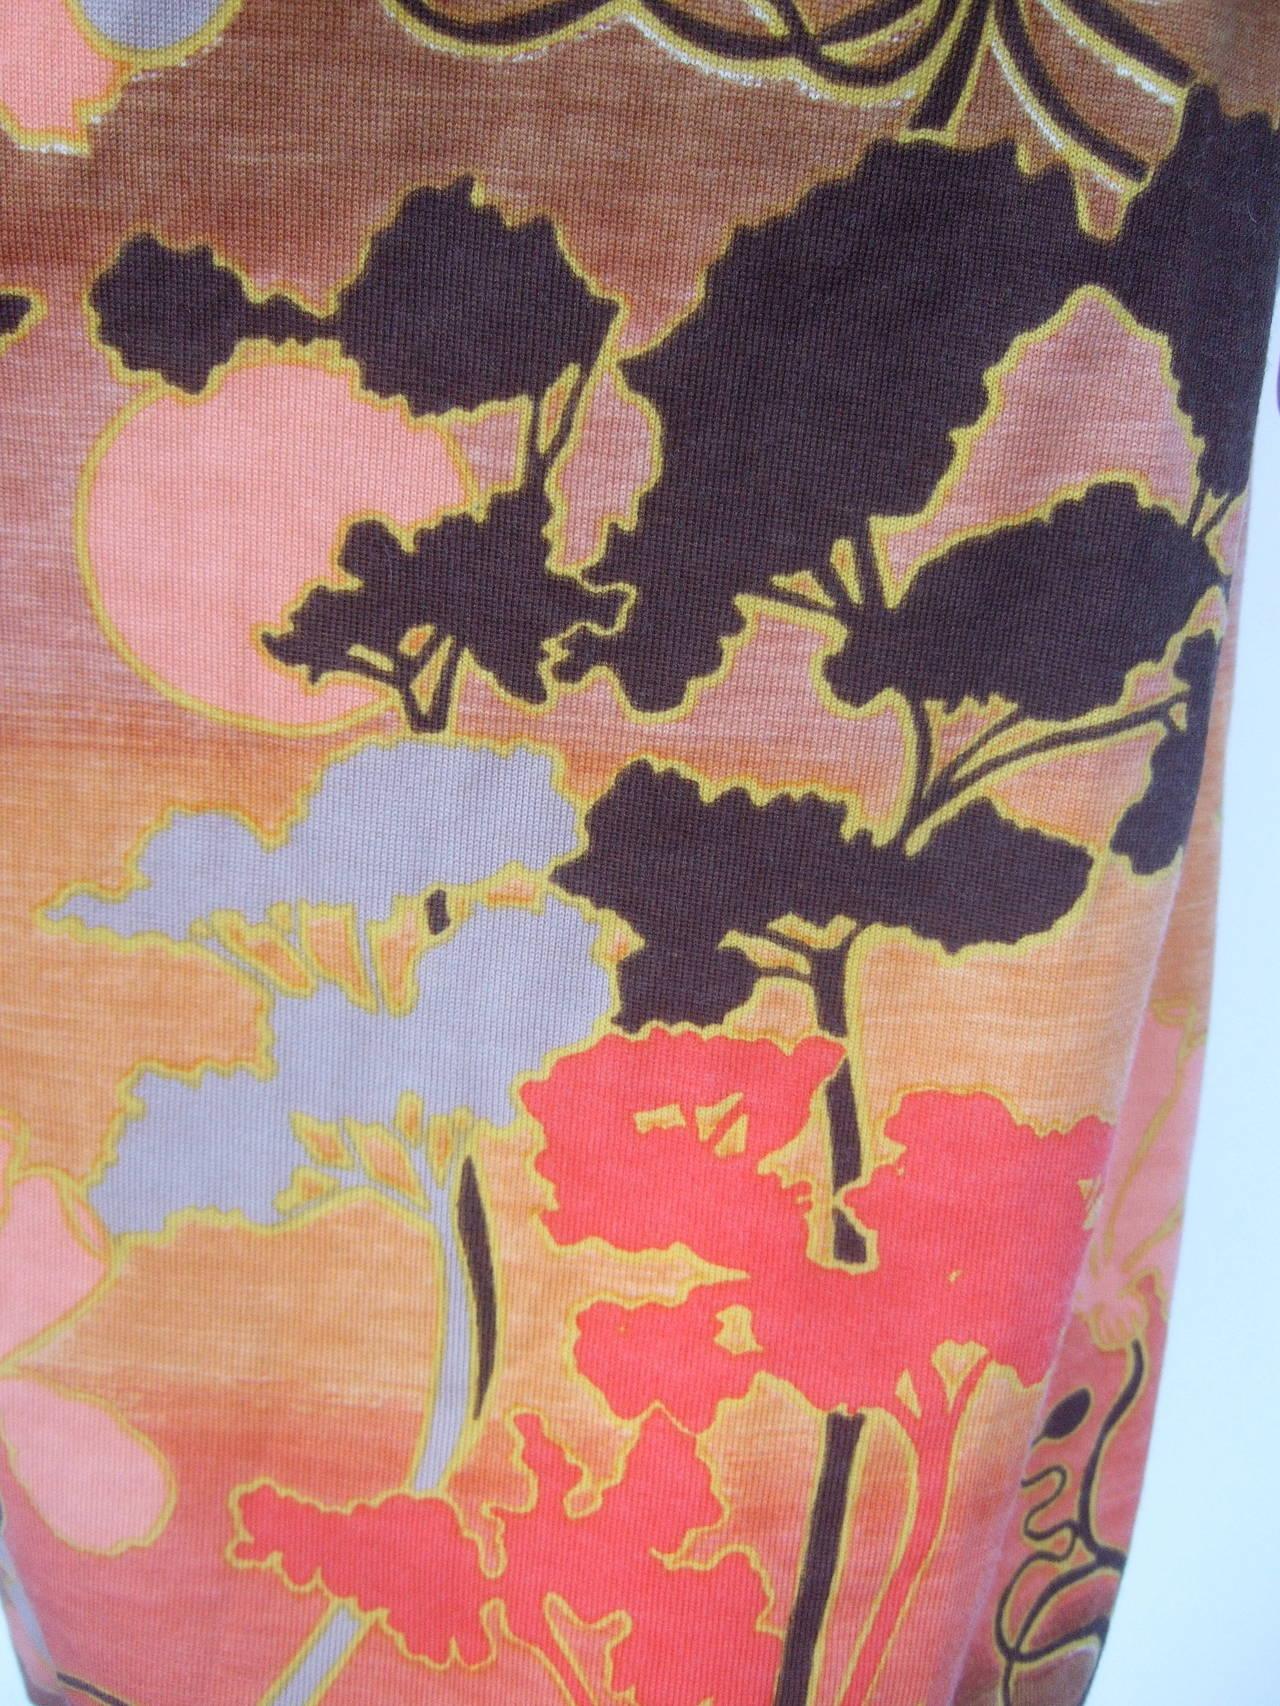 Italian Floral Print Merino Wool Knit Dress c 1970s For Sale 1